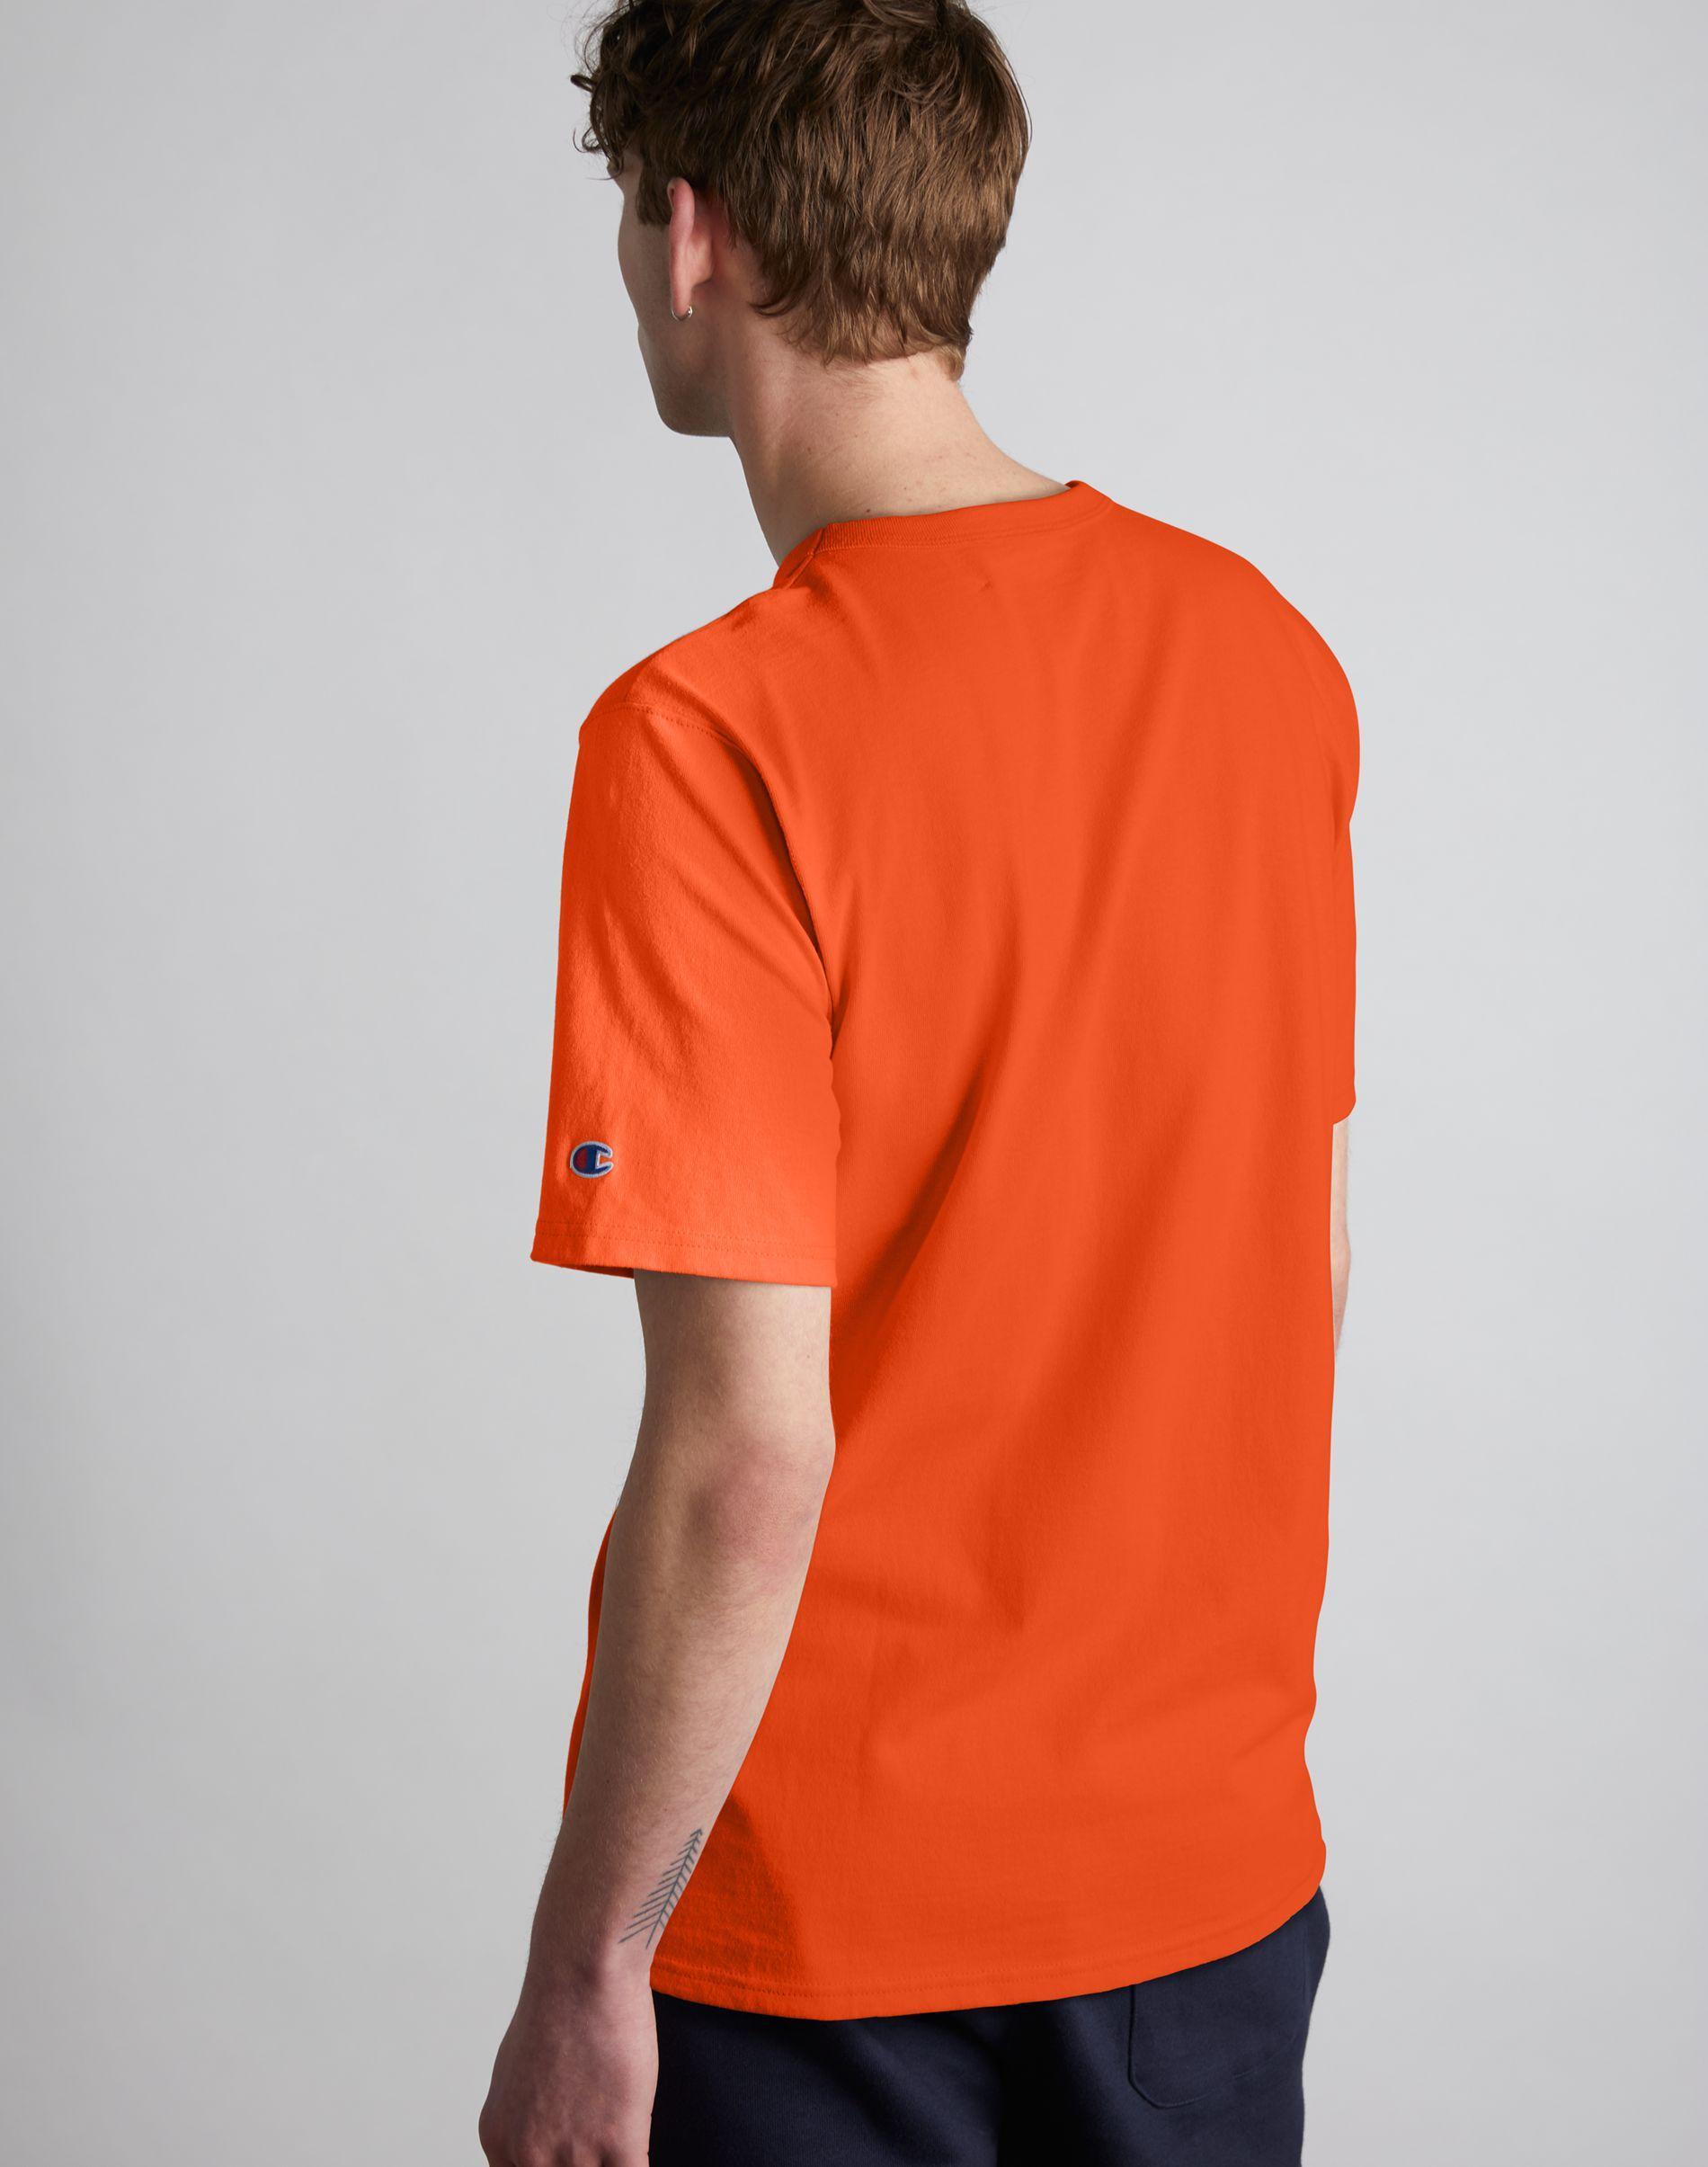 on sale a3df3 7fd2b Champion Orange Exclusive Nhl Tee, Philadelphia Flyers Vintage Marks Series  1967-68 for men